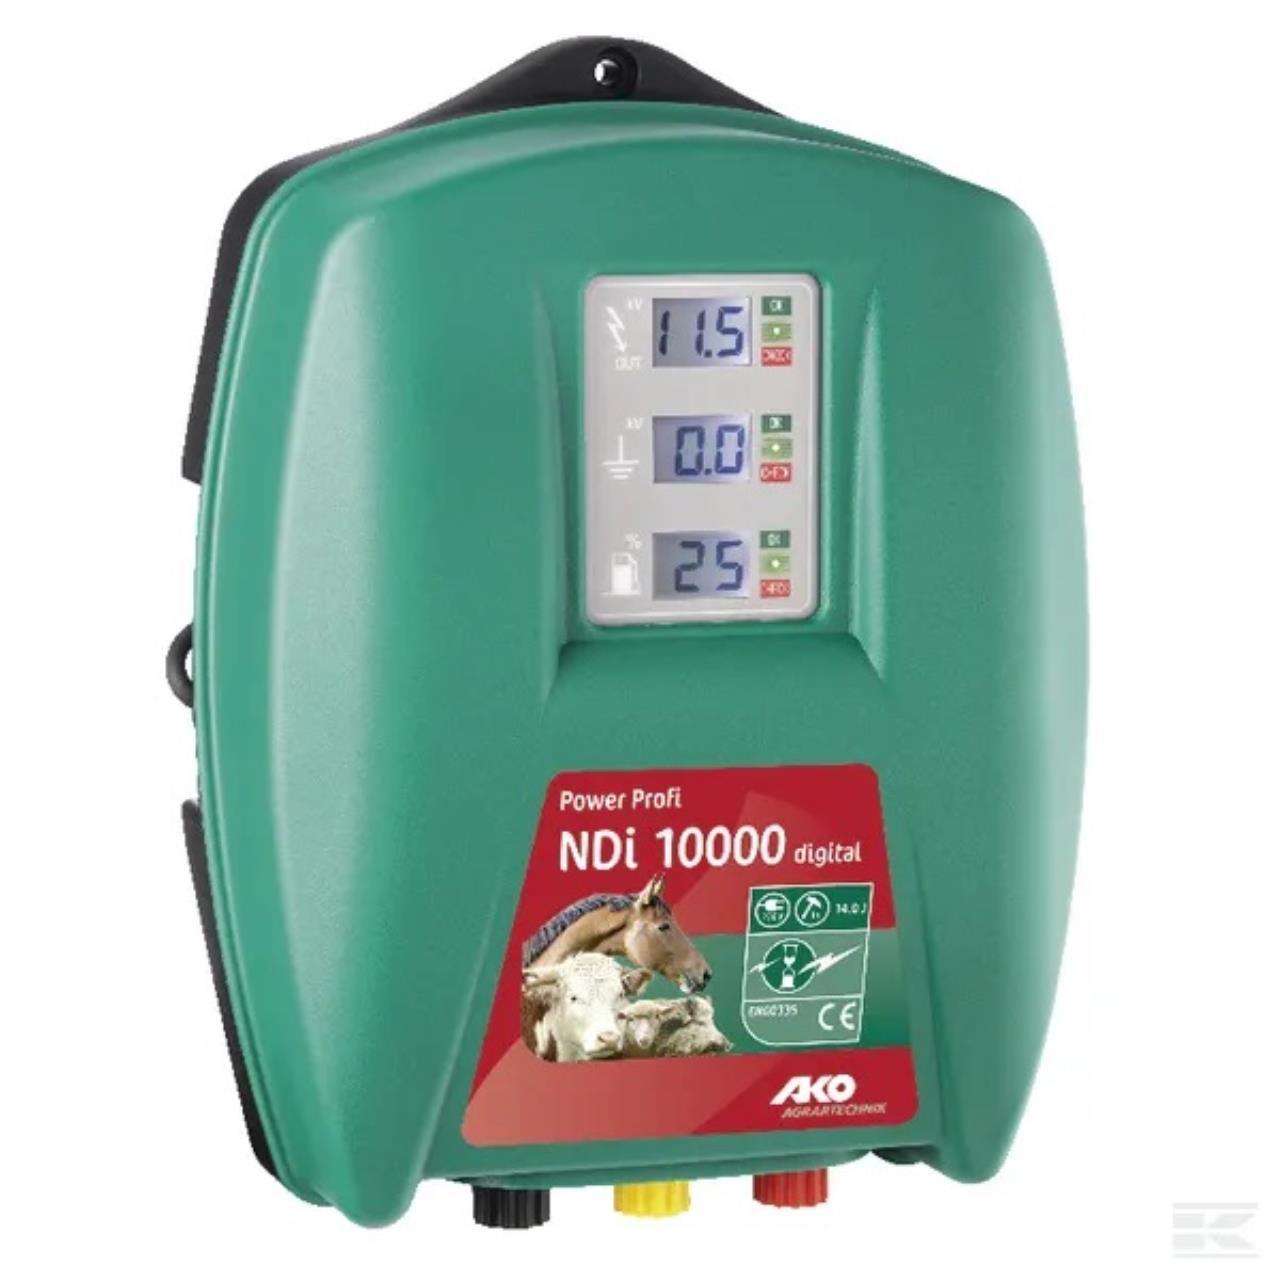 AKO El-hegn Powerprofi NDI10000